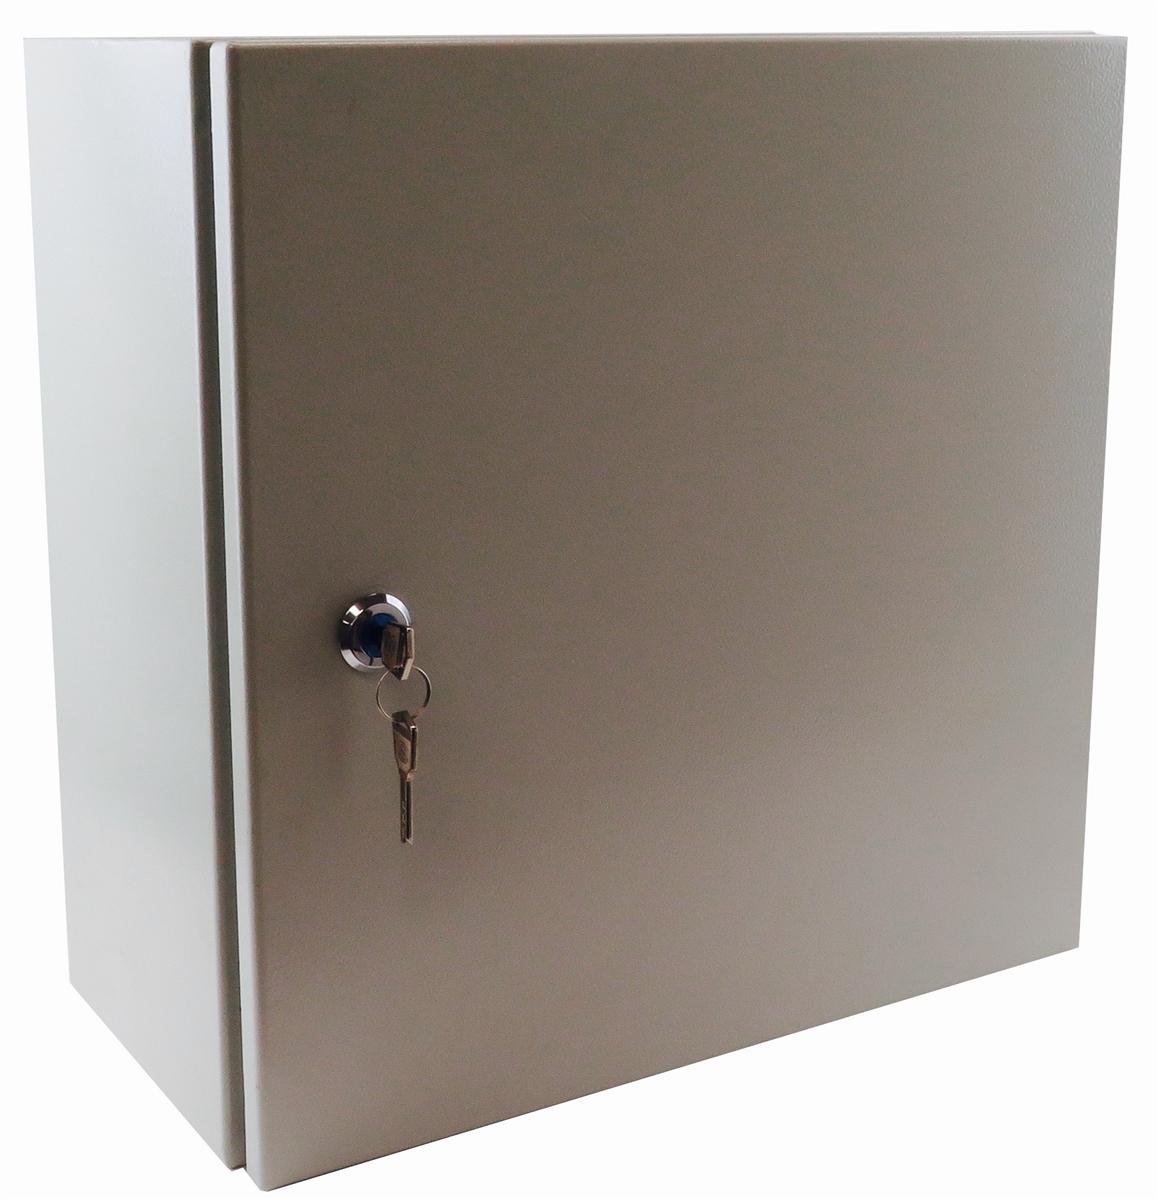 YuCo YC-12x12x6-UL-FE Electrical Box IP66 Nema Type 4 Enclosure Fully Enclosed